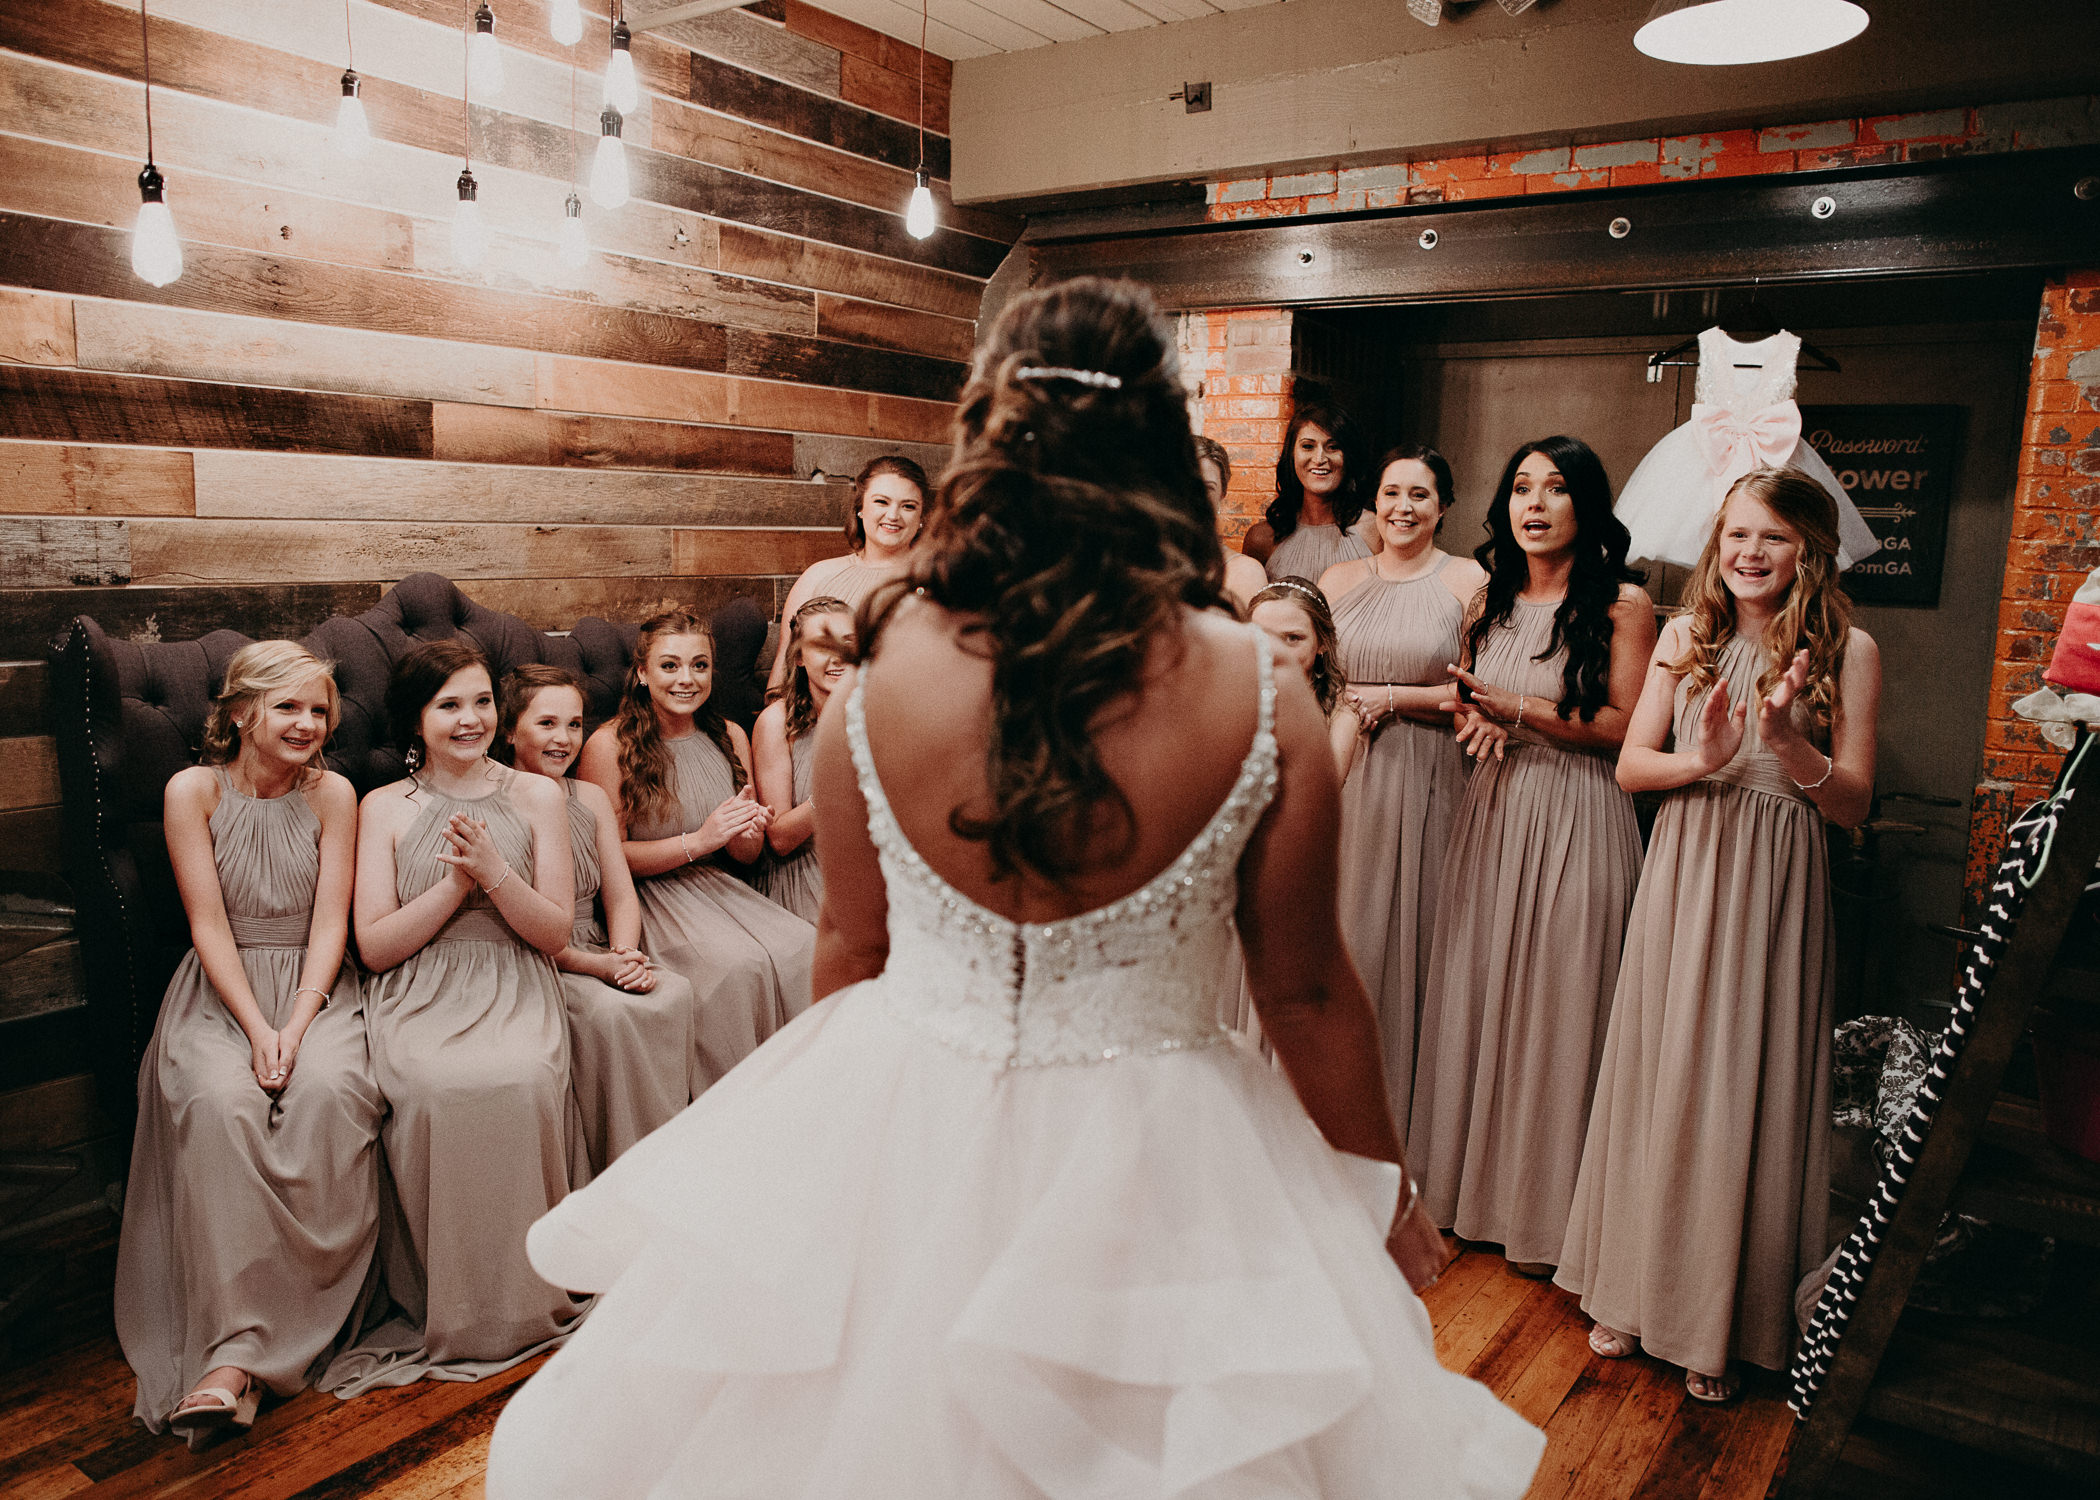 13 4 - Atlanta Wedding Photographer - The engine room - Ga - Wedding trends - Aline Marin Photography.jpg